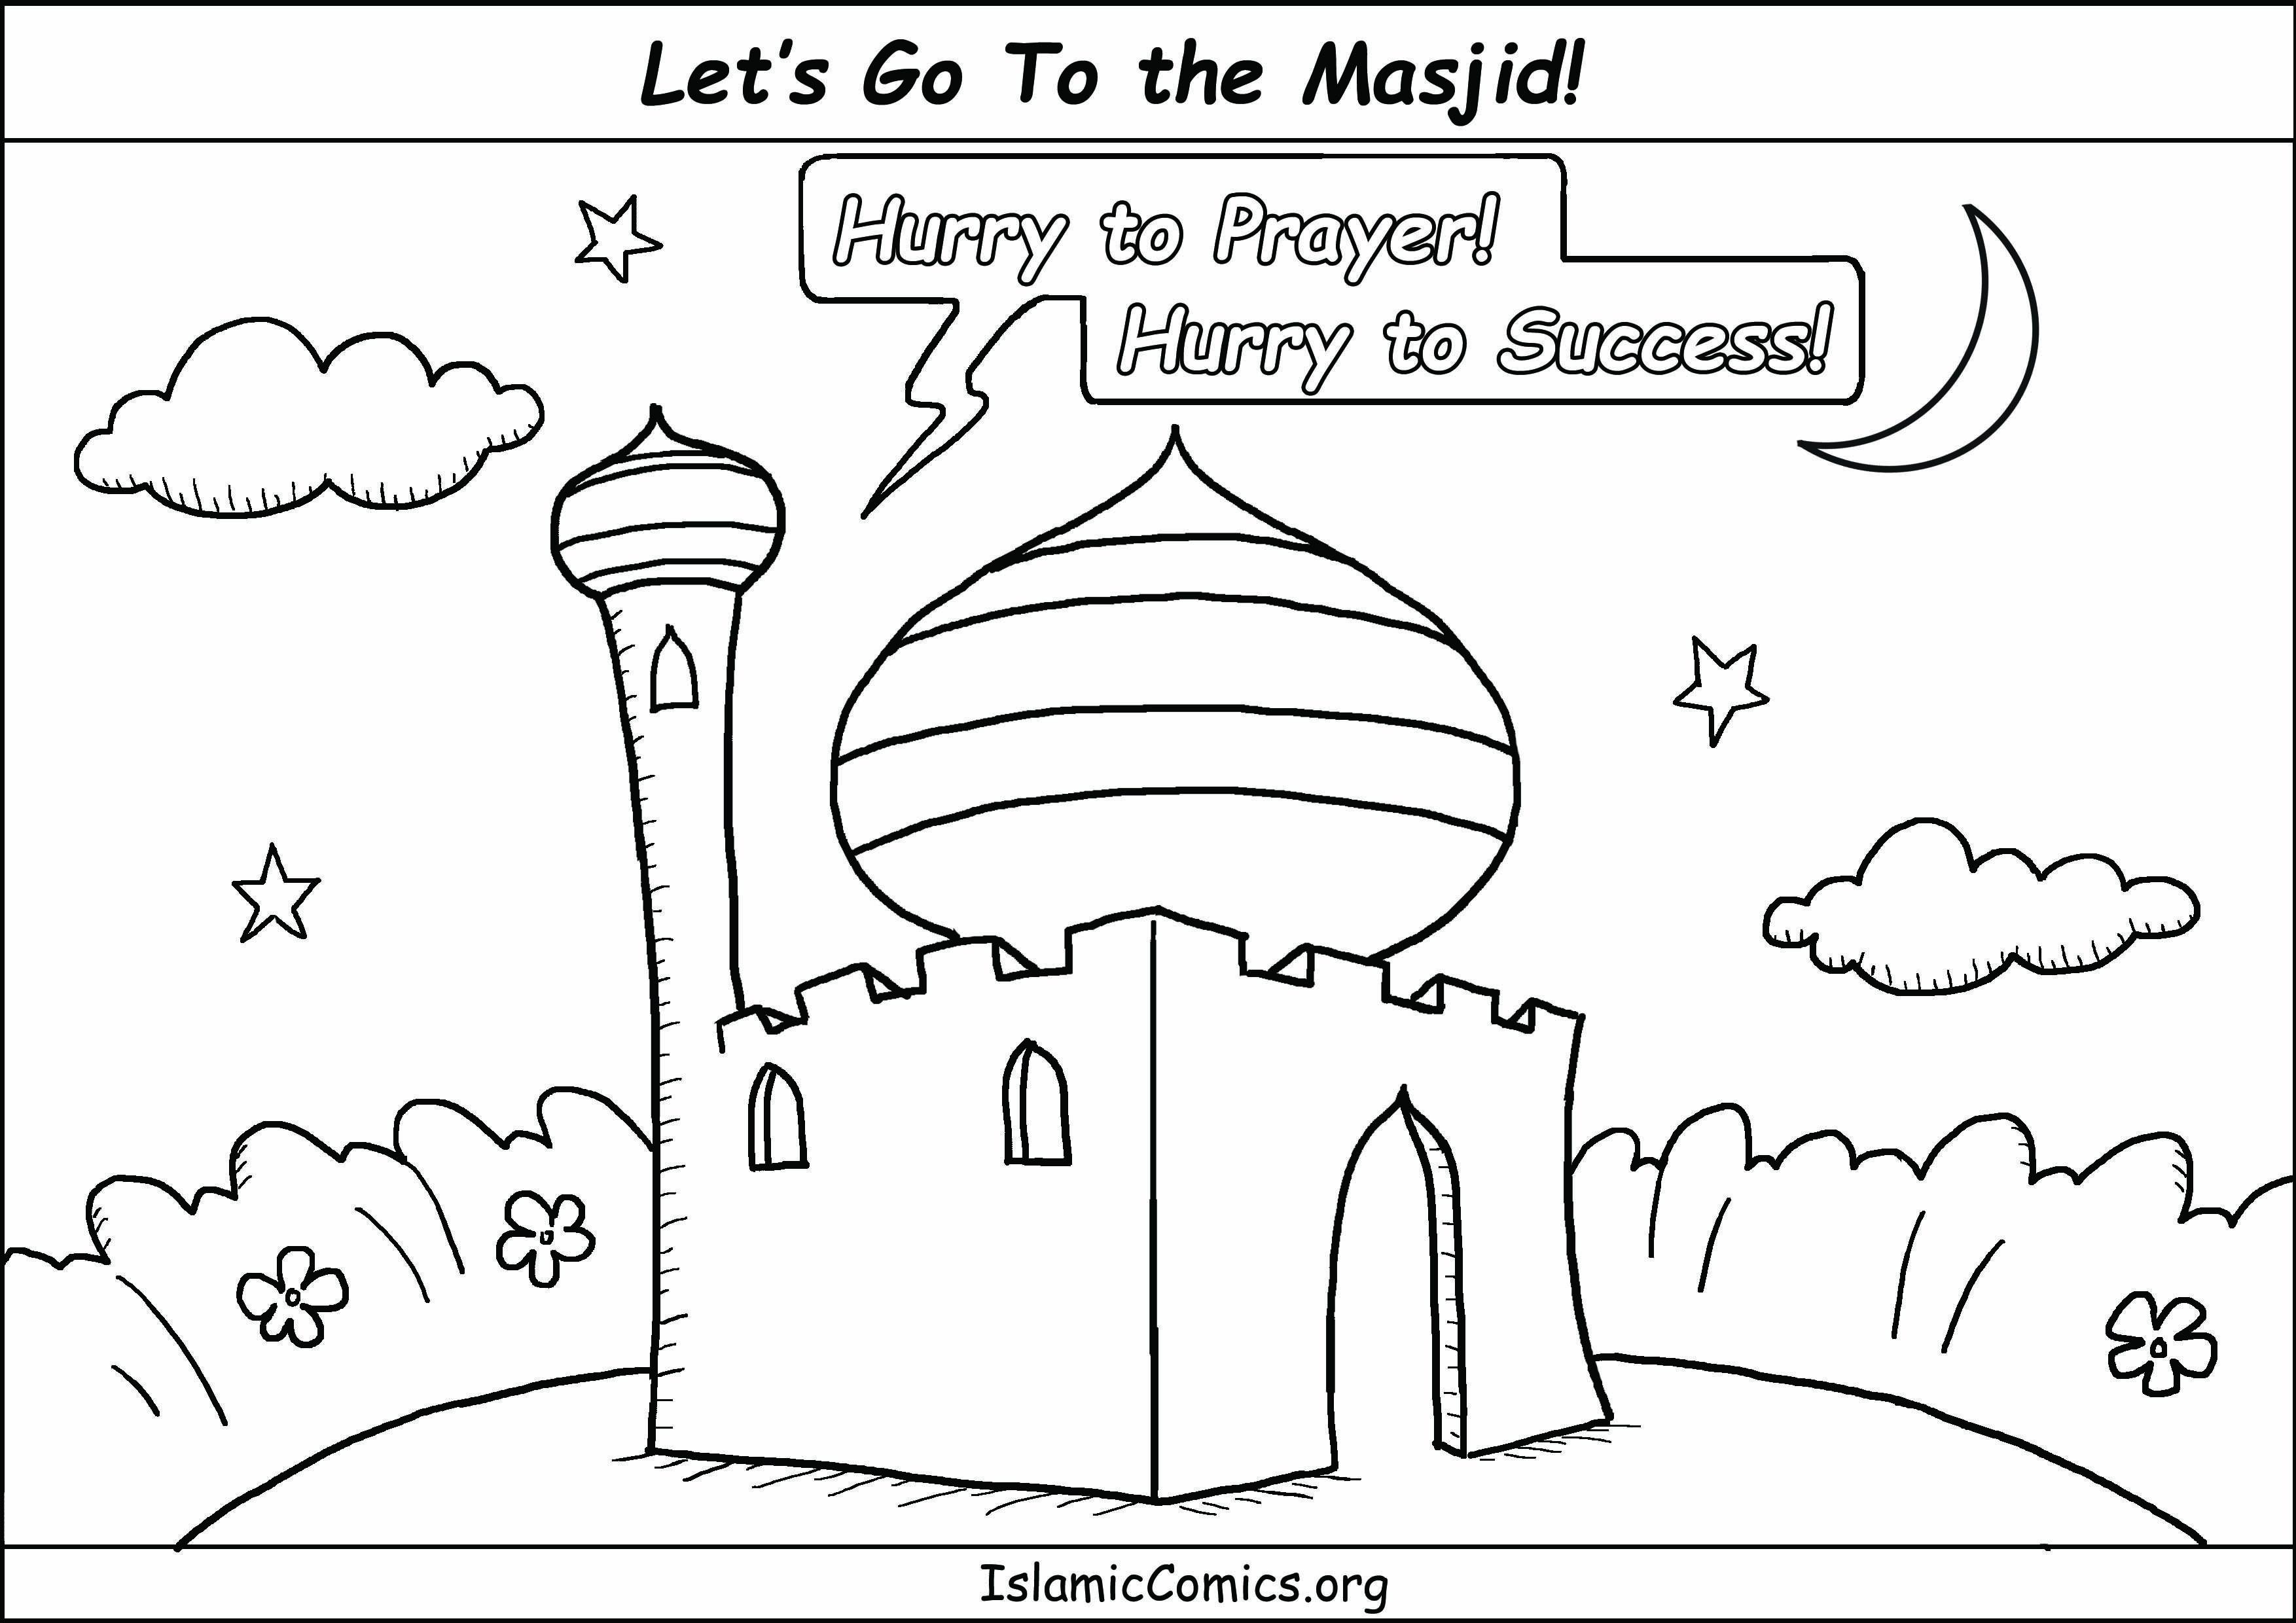 Fun Islamic Coloring Sheets For Kids  Ramadan Coloring Pages & Activity Sheets – Islamic ics